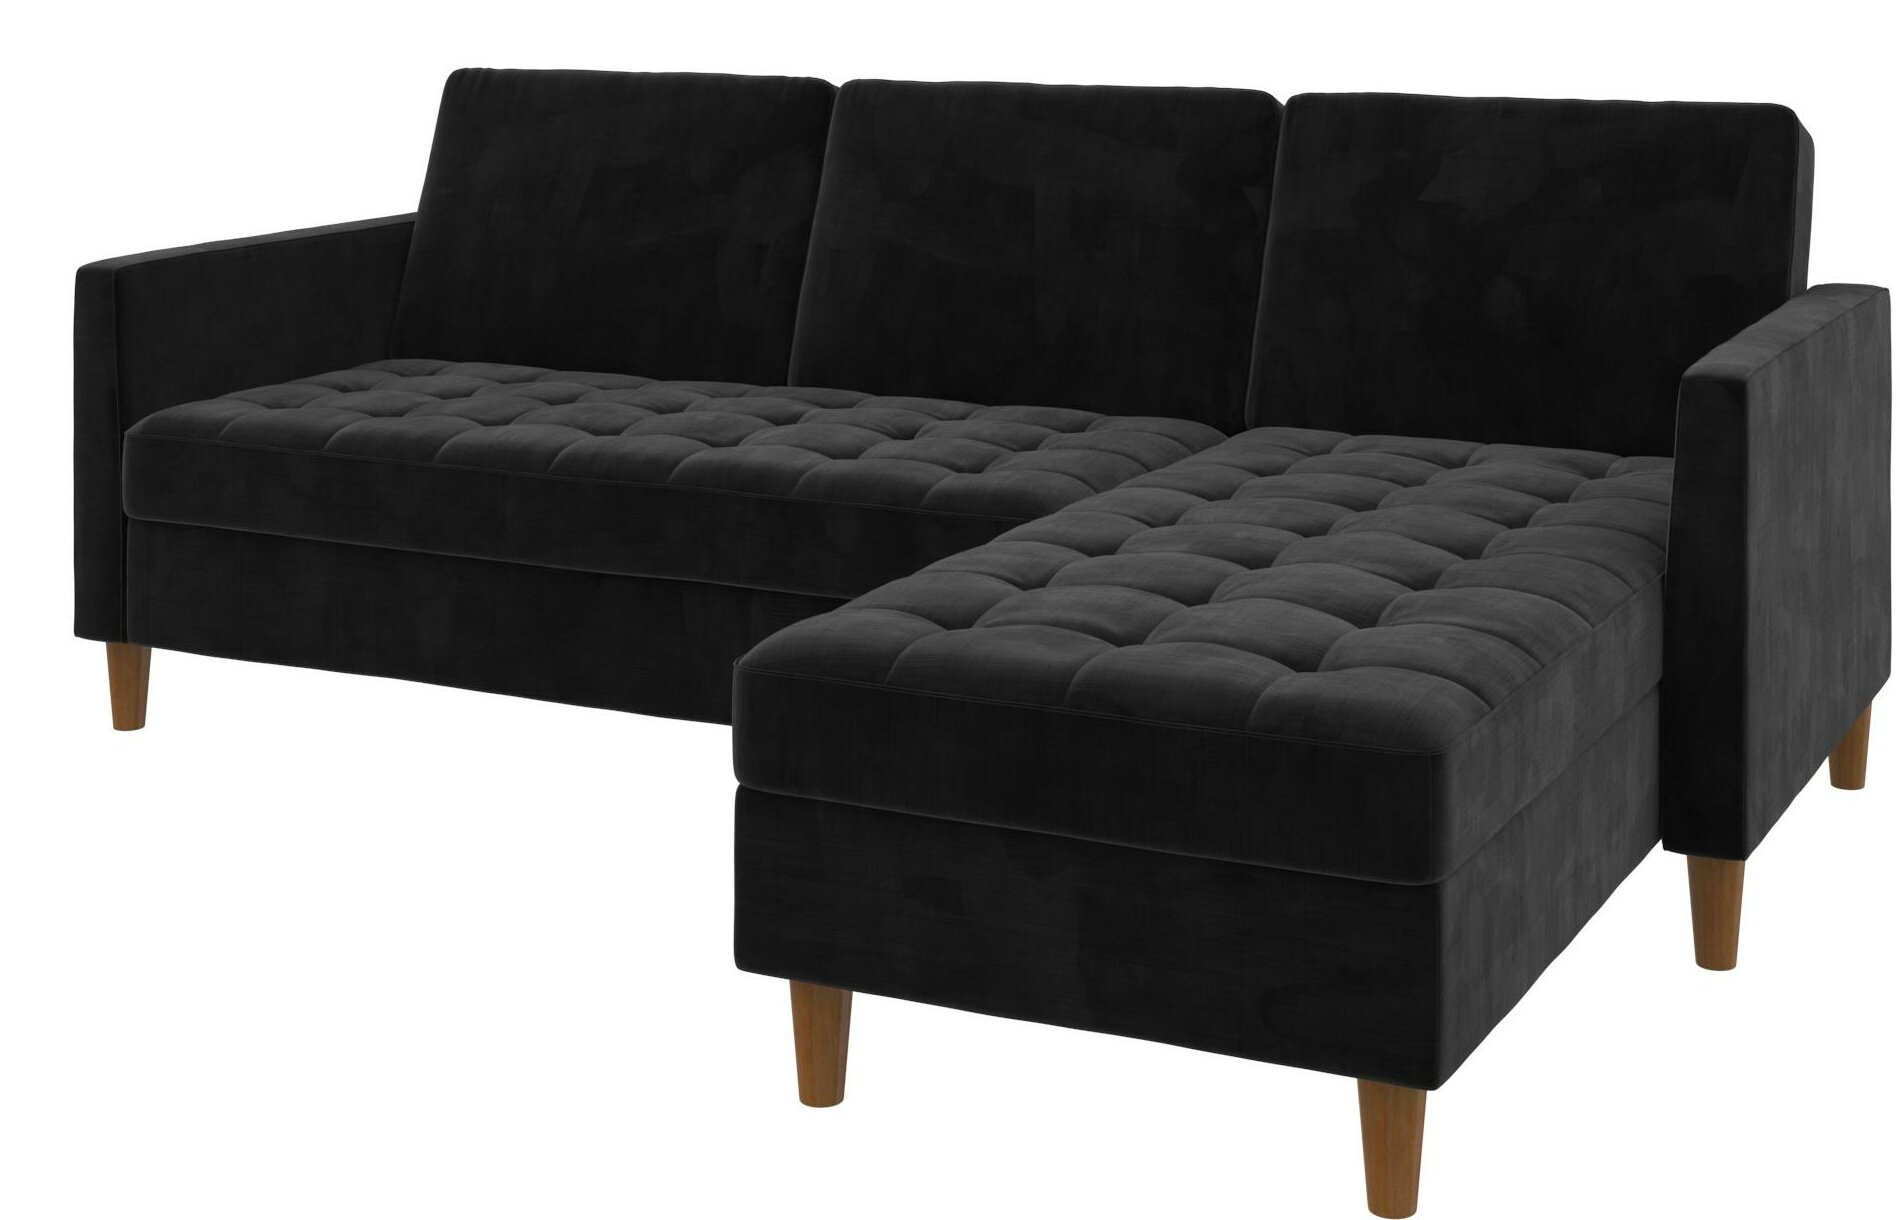 Swell Bozeman Reversible Sleeper Sectional Theyellowbook Wood Chair Design Ideas Theyellowbookinfo